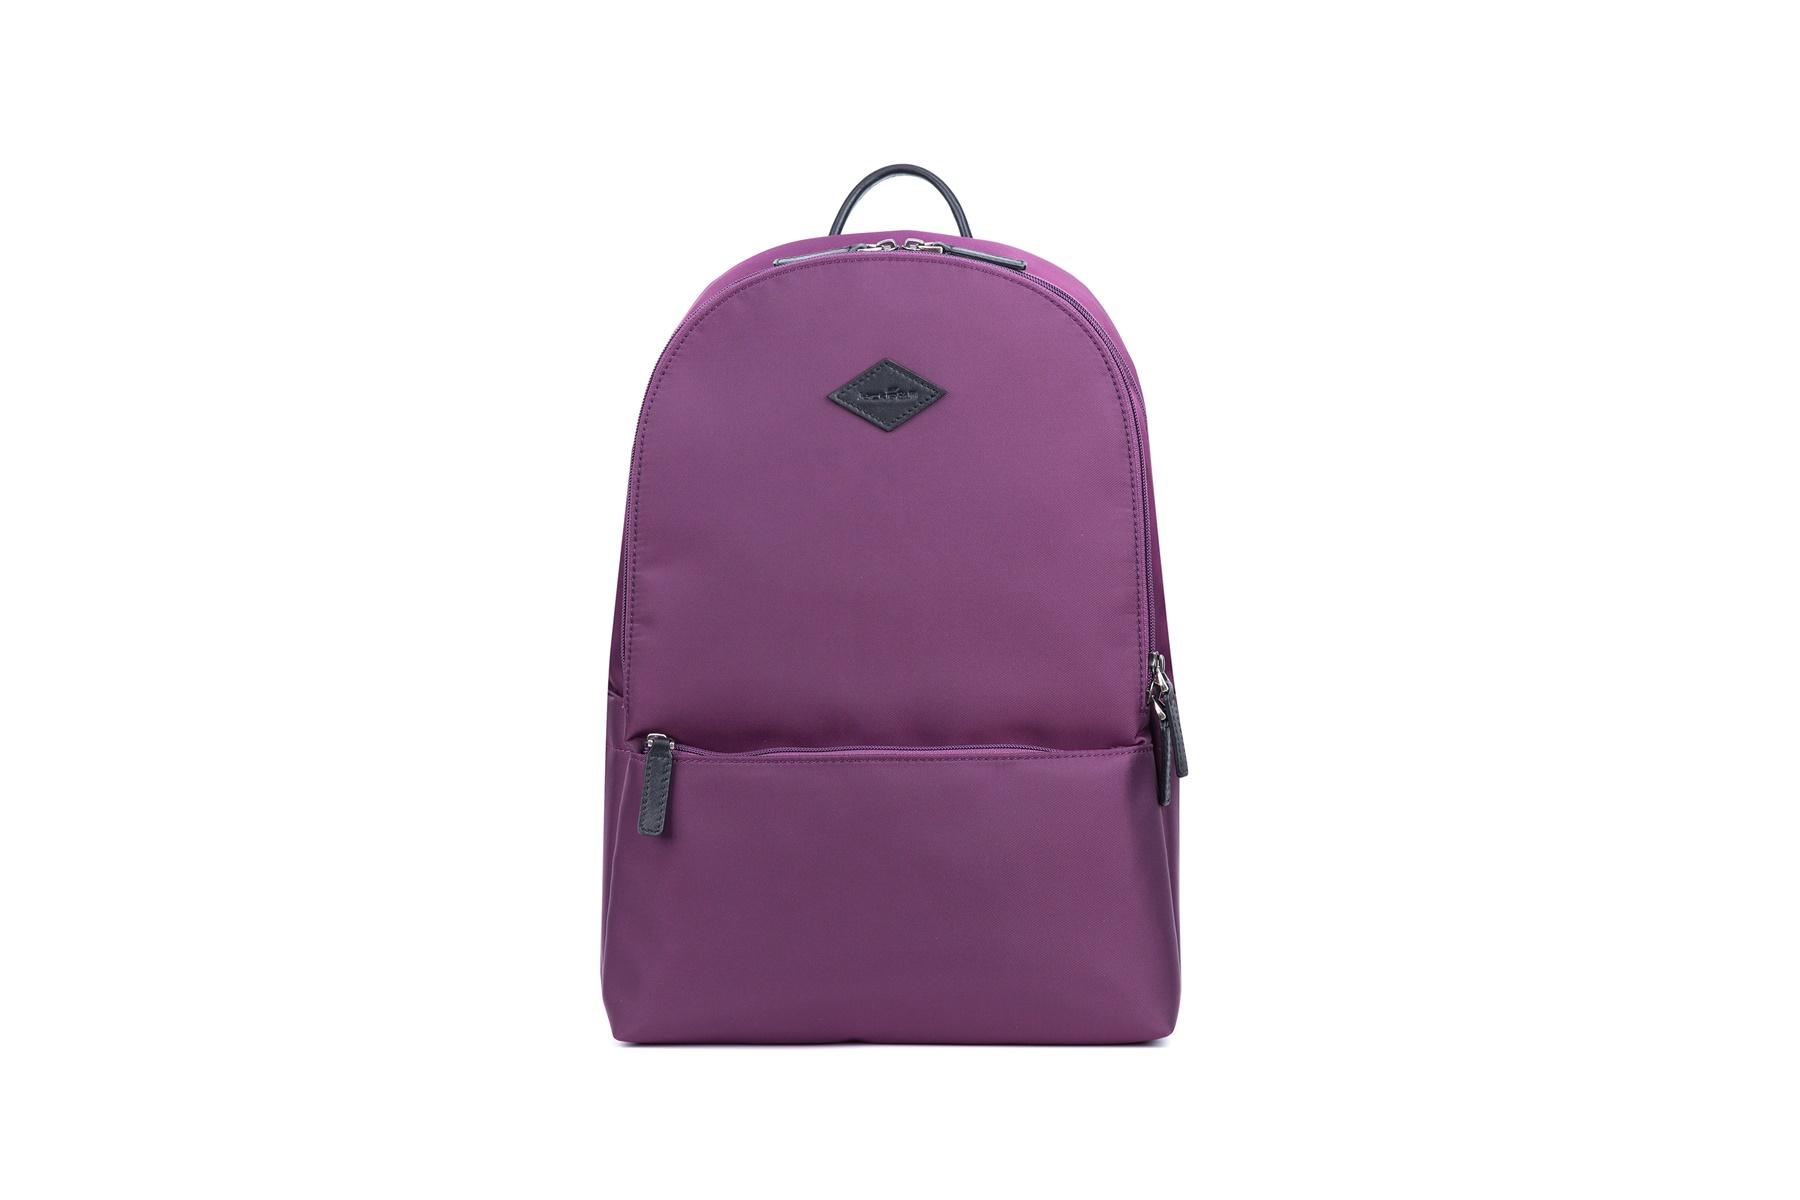 GF bags-Professional Stylish Backpacks Big Backpack Bags Manufacture